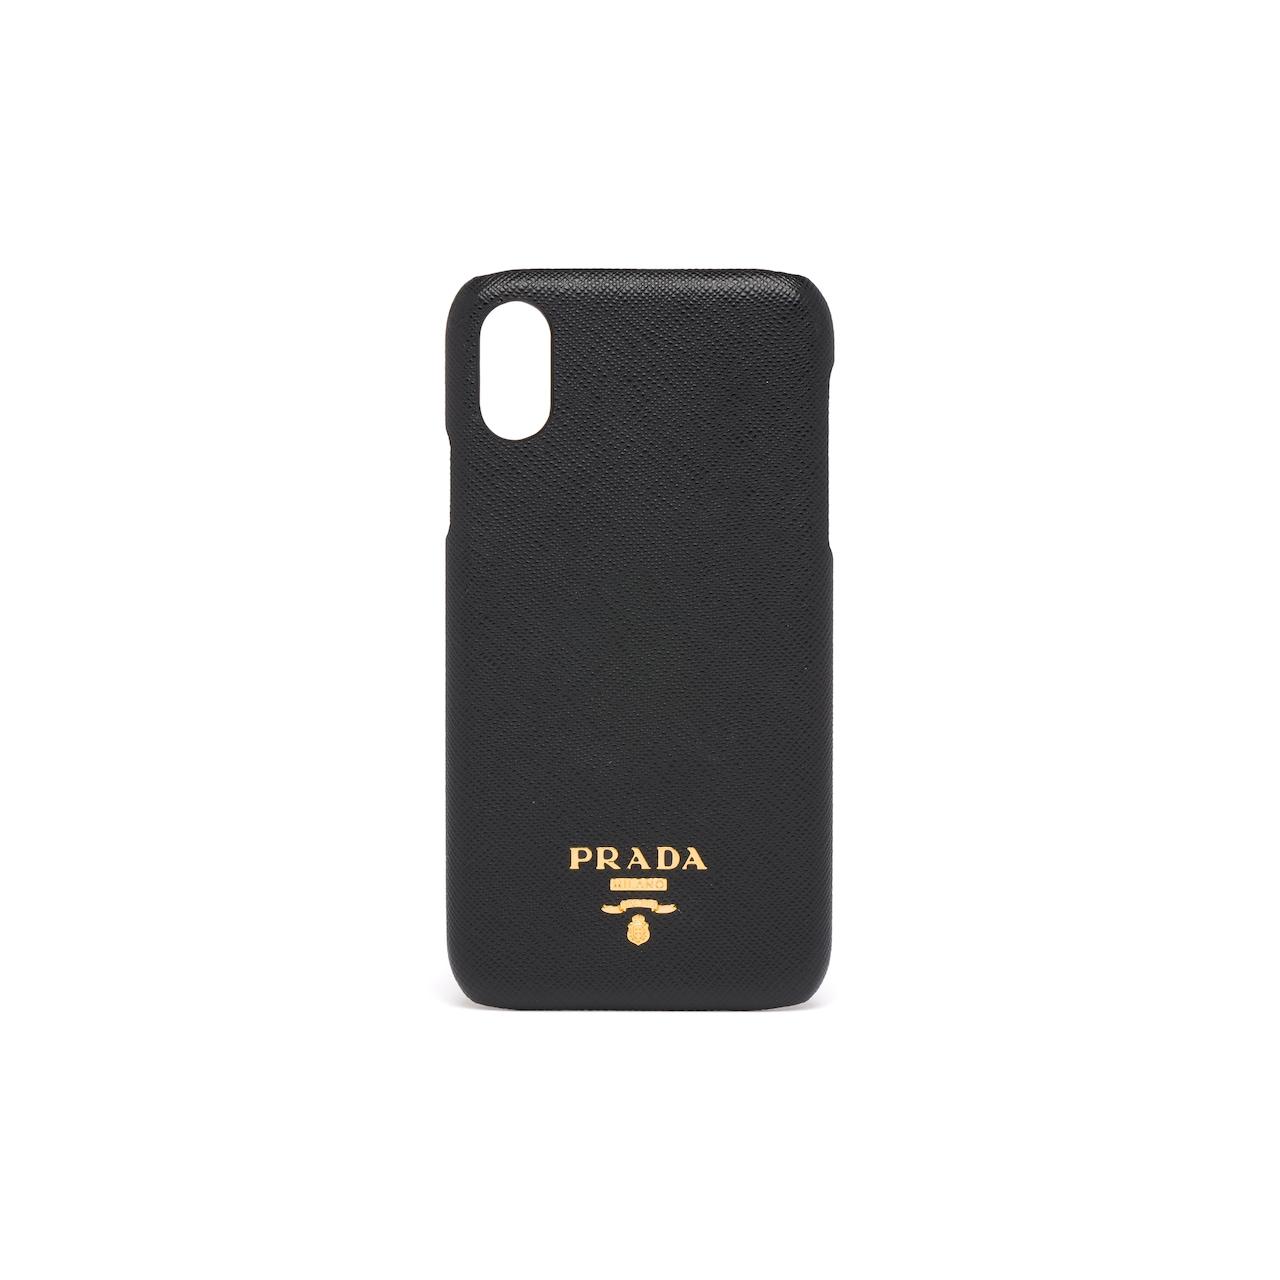 Prada Saffiano 皮革iPhone XR 手机套 1